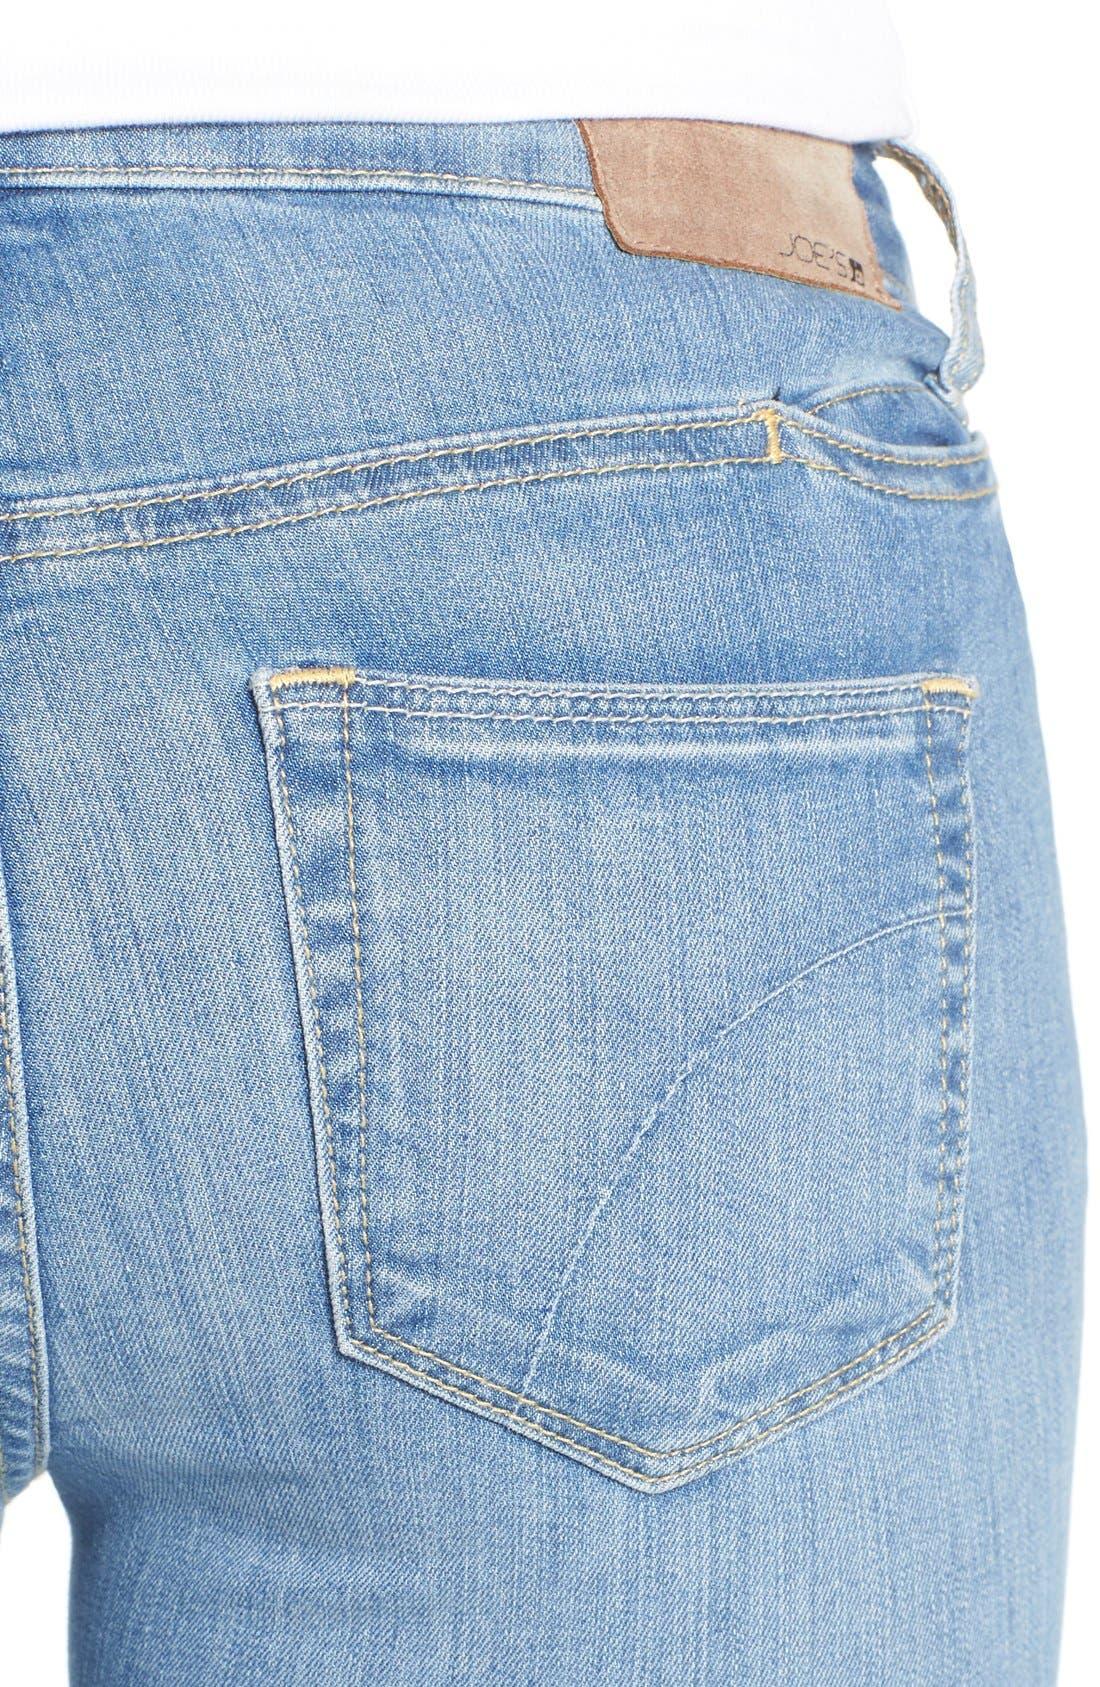 Alternate Image 4  - Joe's 'Vixen' Ankle Skinny Jeans with Phone Pocket (Mitzi)